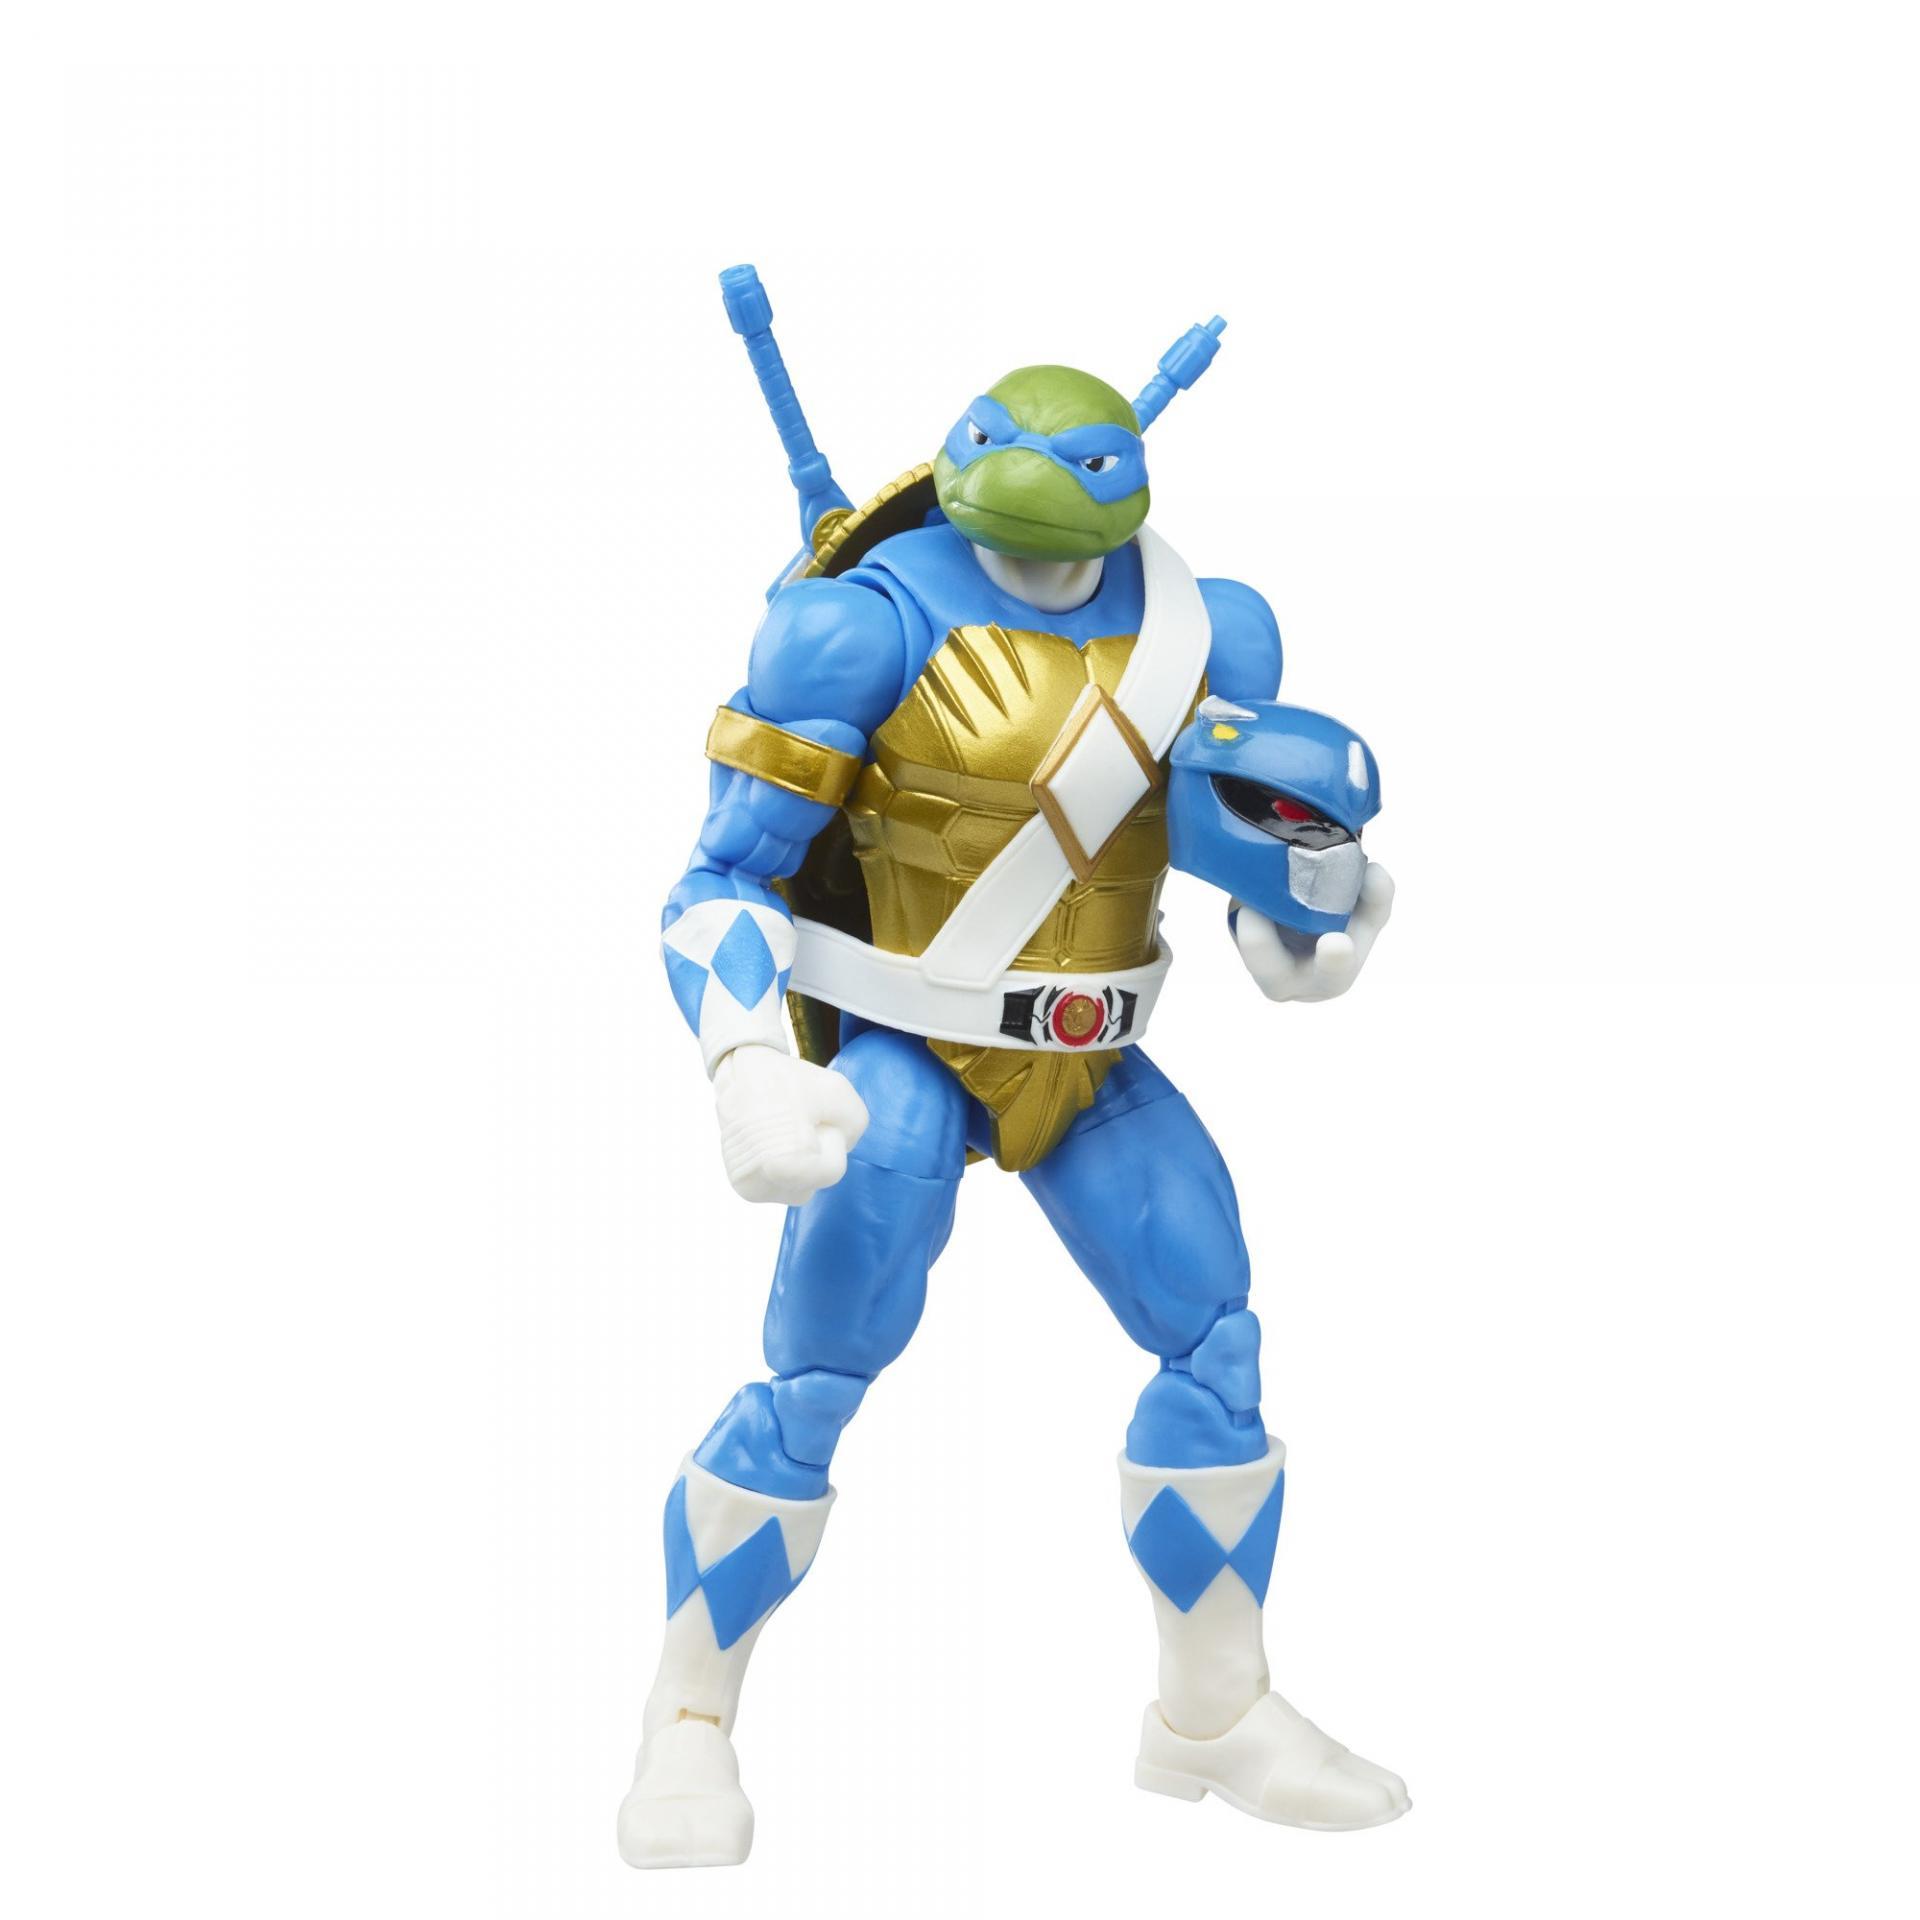 Power rangers tortue ninja tmnt lightning collection morphed donatello morphed leonardo 15cm6